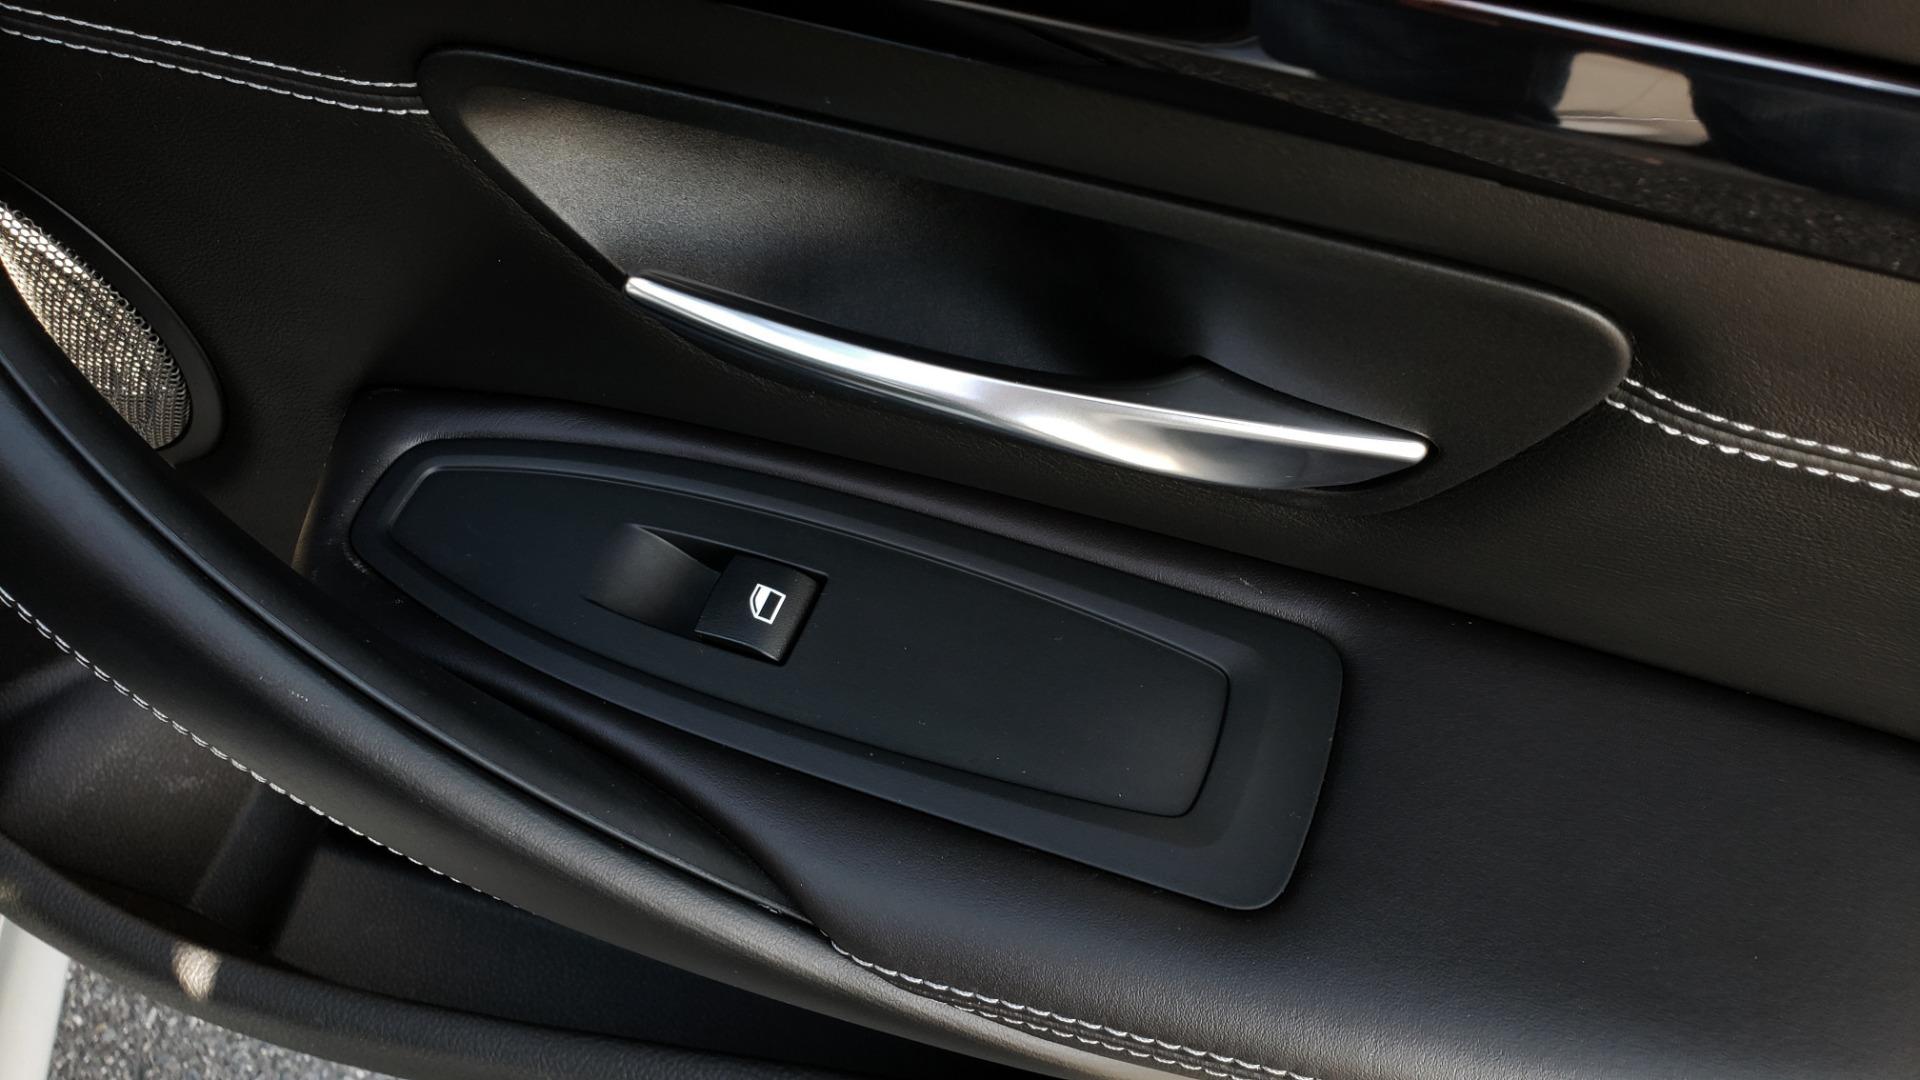 Used 2015 BMW M4 COUPE / EXEC PKG / DRVR ASST PLUS / LIGHTING / M-SUSPENSION for sale Sold at Formula Imports in Charlotte NC 28227 74